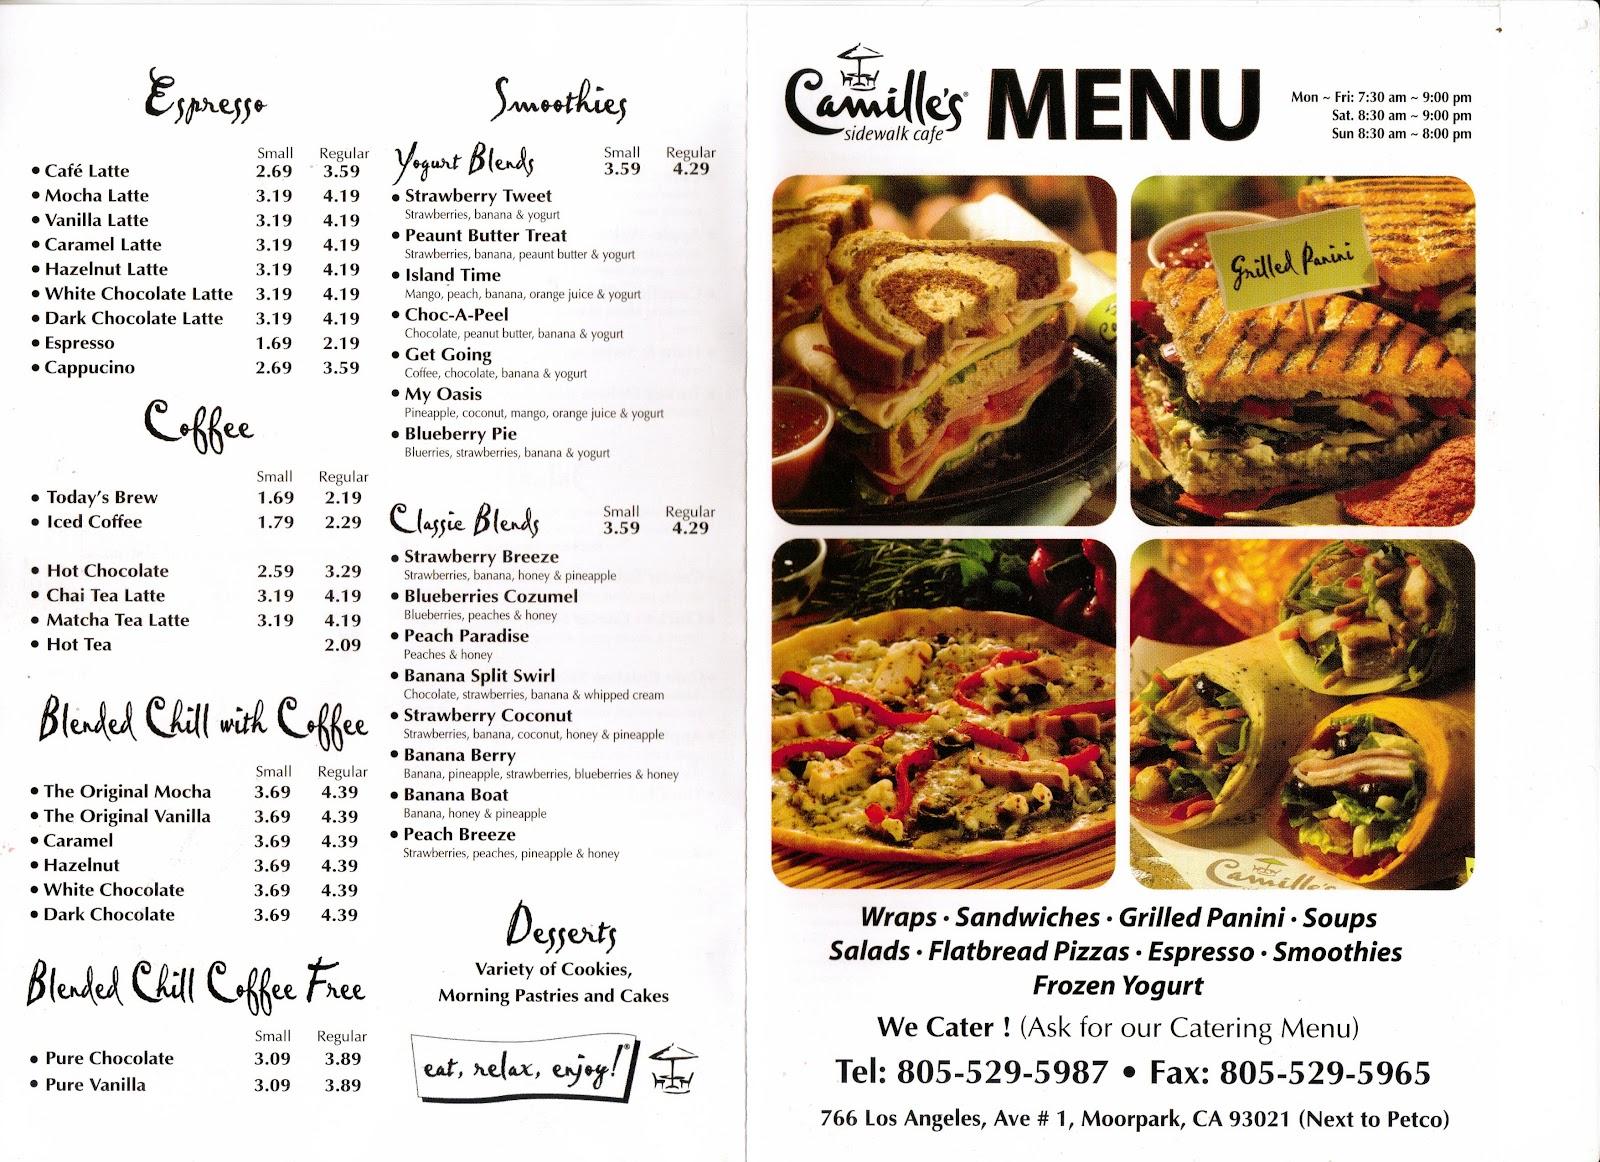 Camille S Sidewalk Cafe Menu